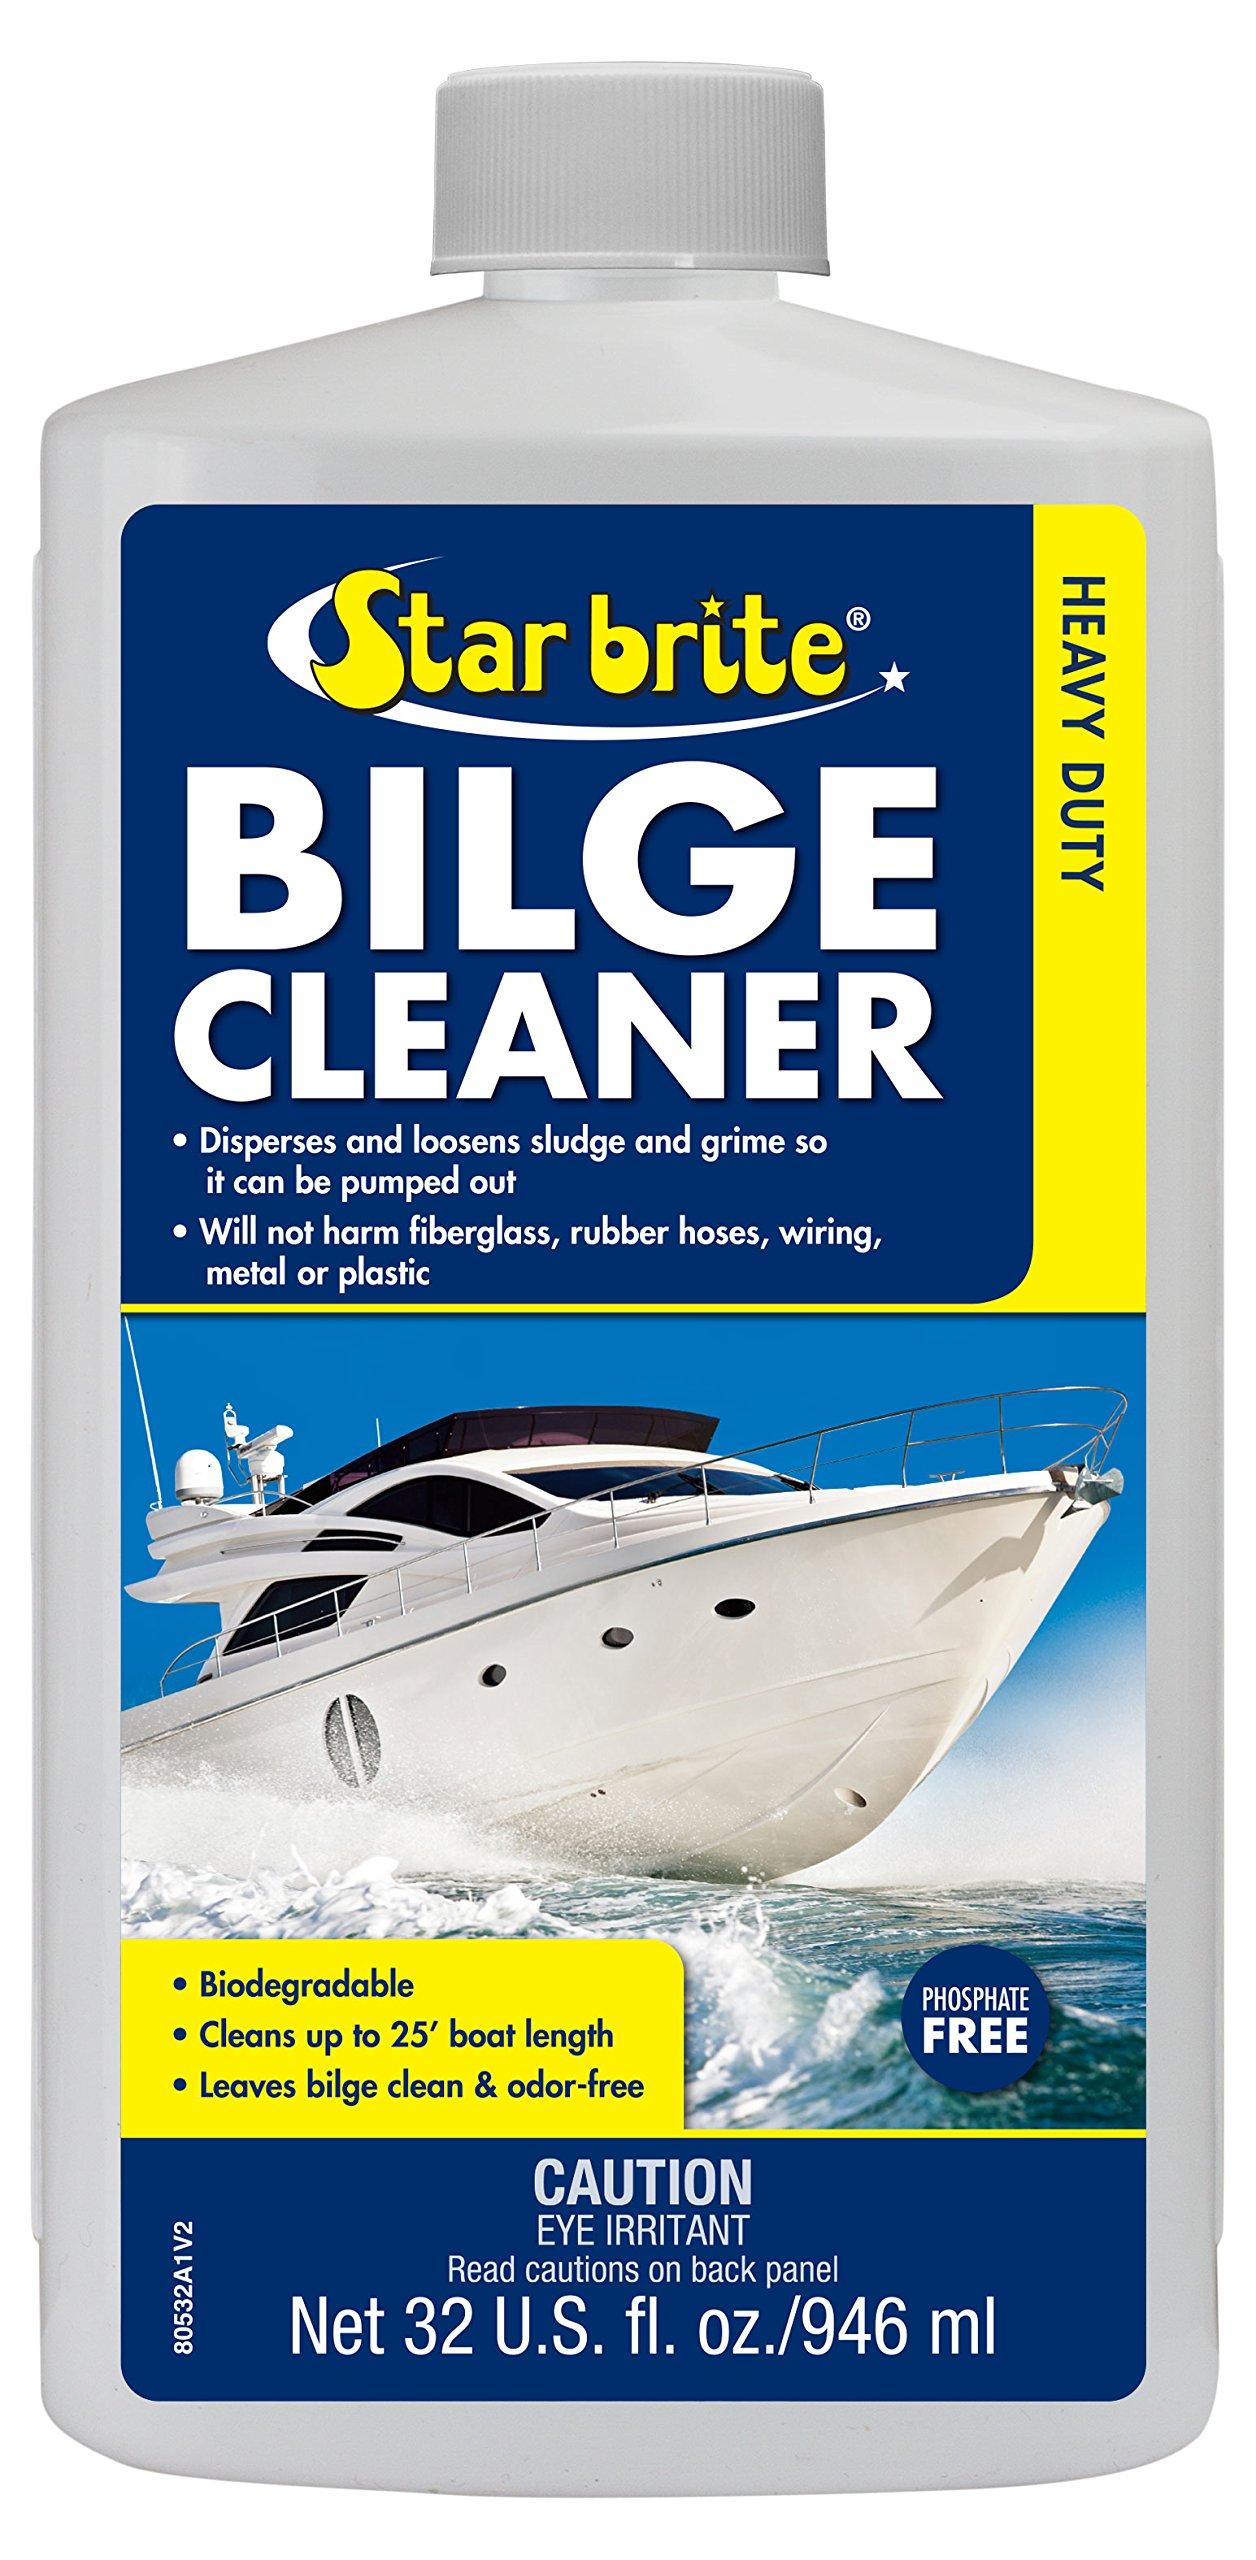 Star brite Bilge Cleaner - 32 oz